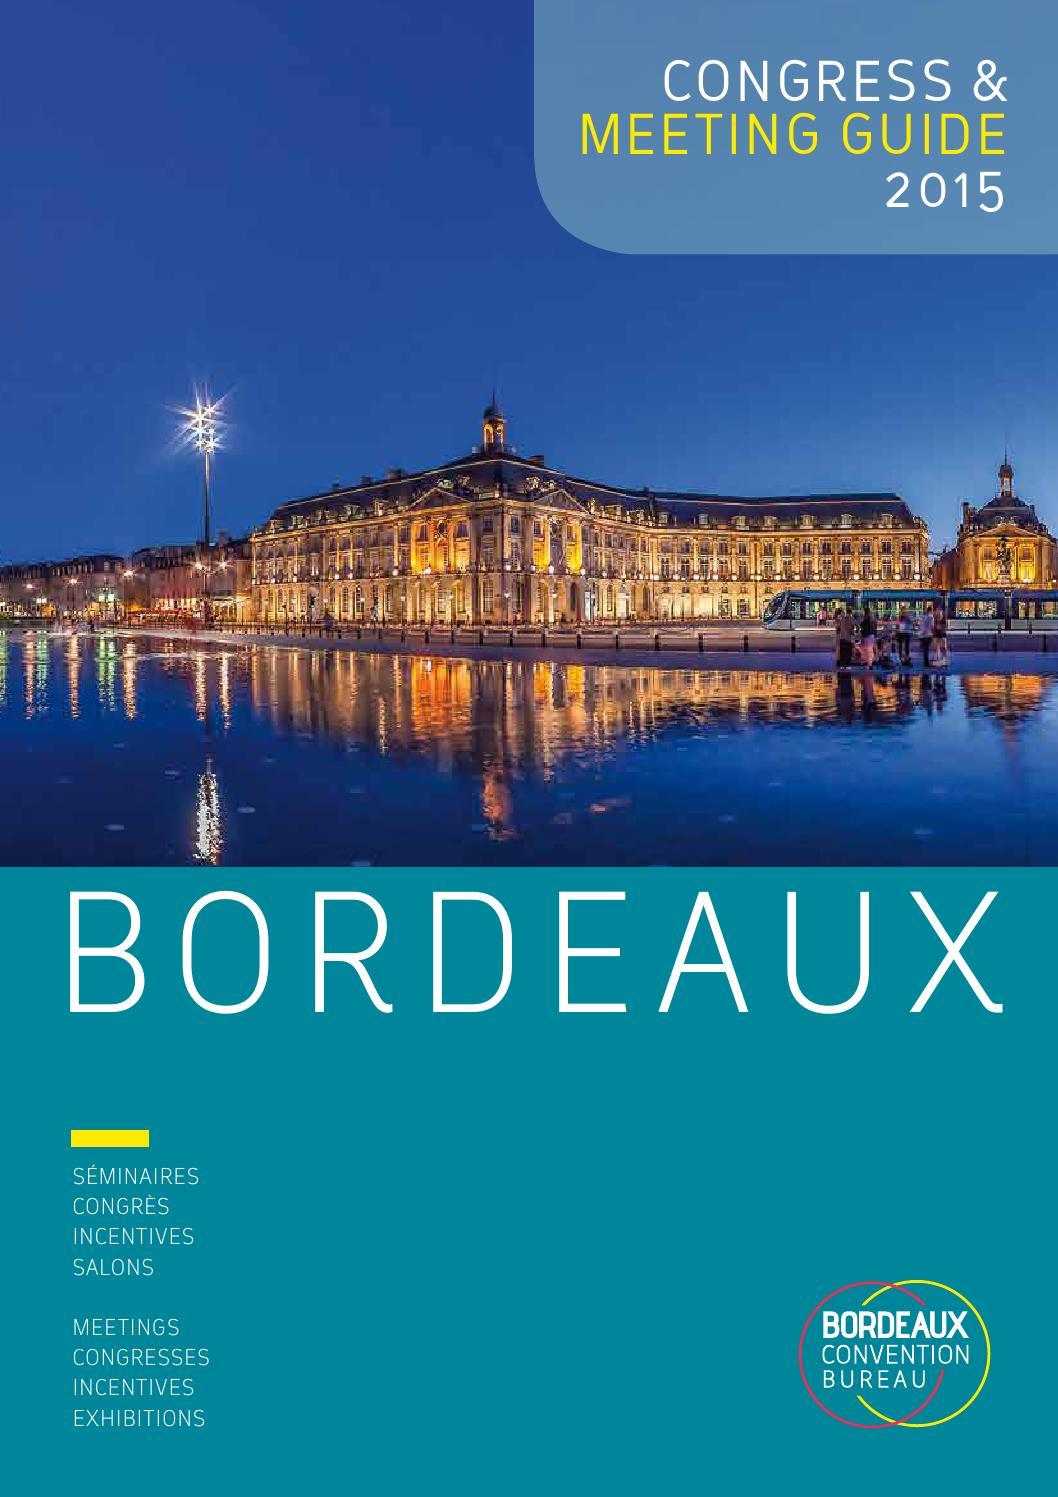 bordeaux meeting guide 2015 by bordeaux convention bureau issuu. Black Bedroom Furniture Sets. Home Design Ideas